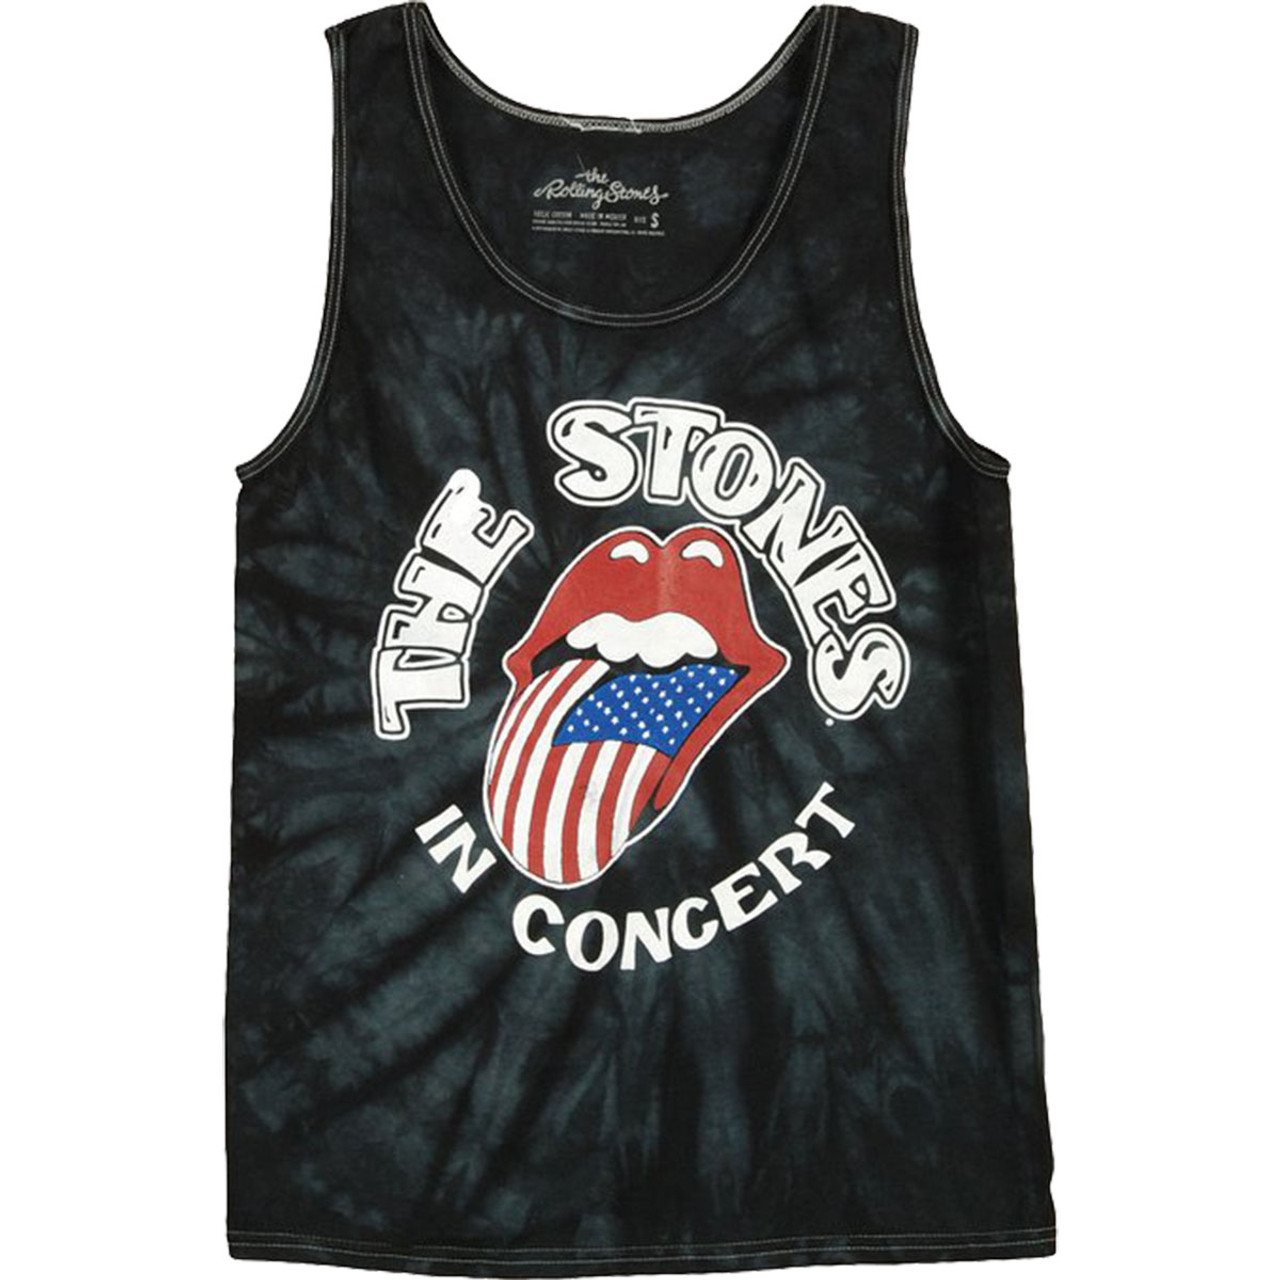 8f66008deb1e50 Bravado Rolling Stones The Stones In Concert Mens Tie Dye Tank Top - Trenz  Shirt Company